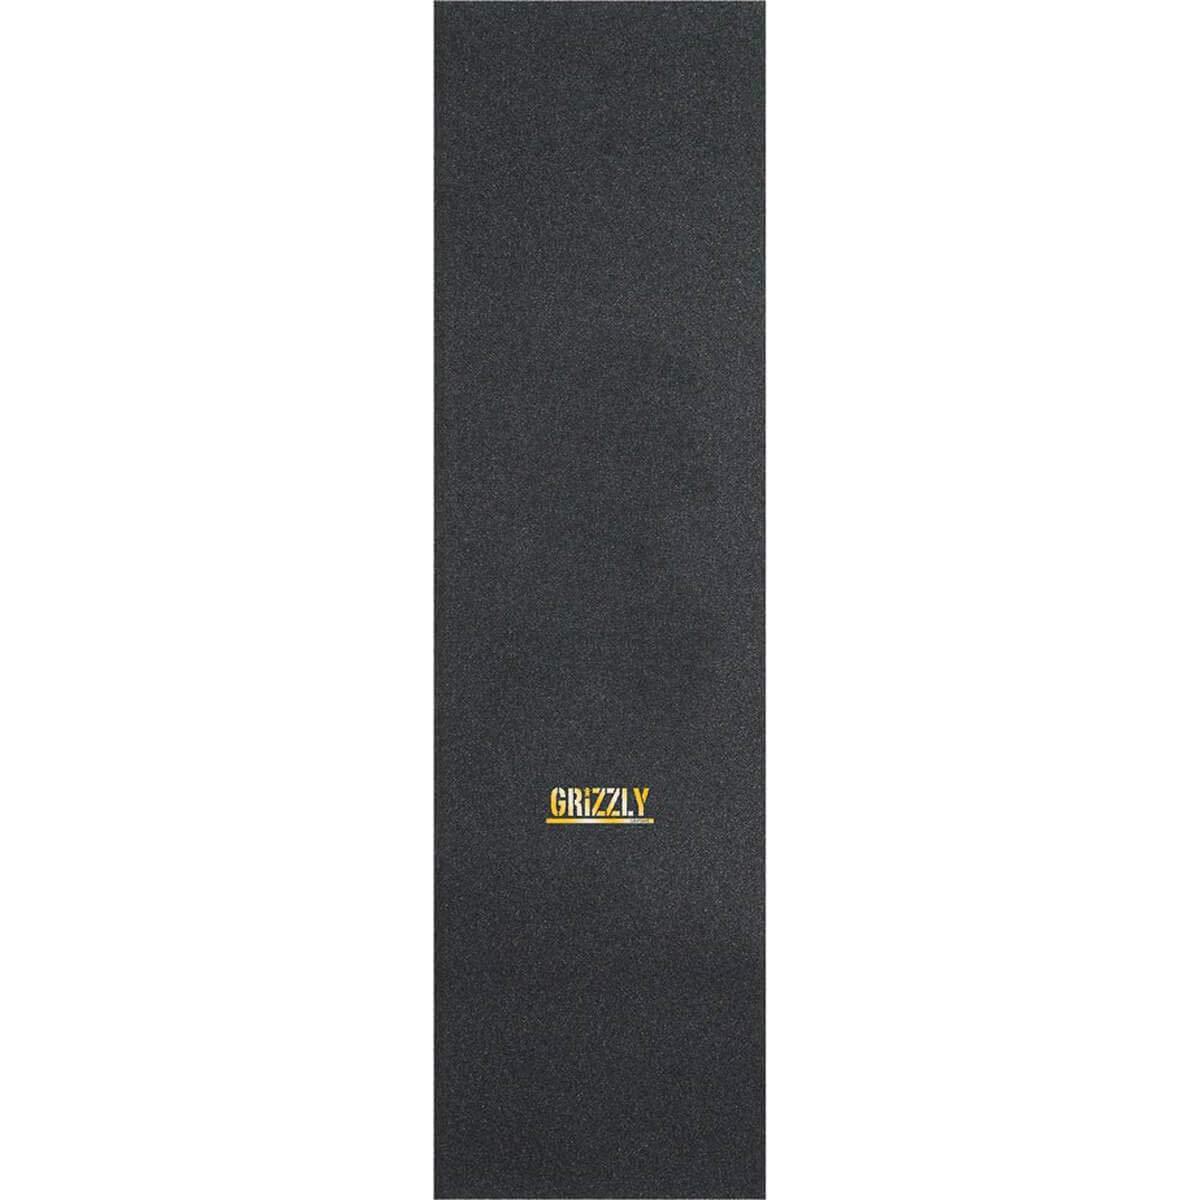 9 x 33 Grizzly Grip Tape Mini Stamp Black Gold Griptape